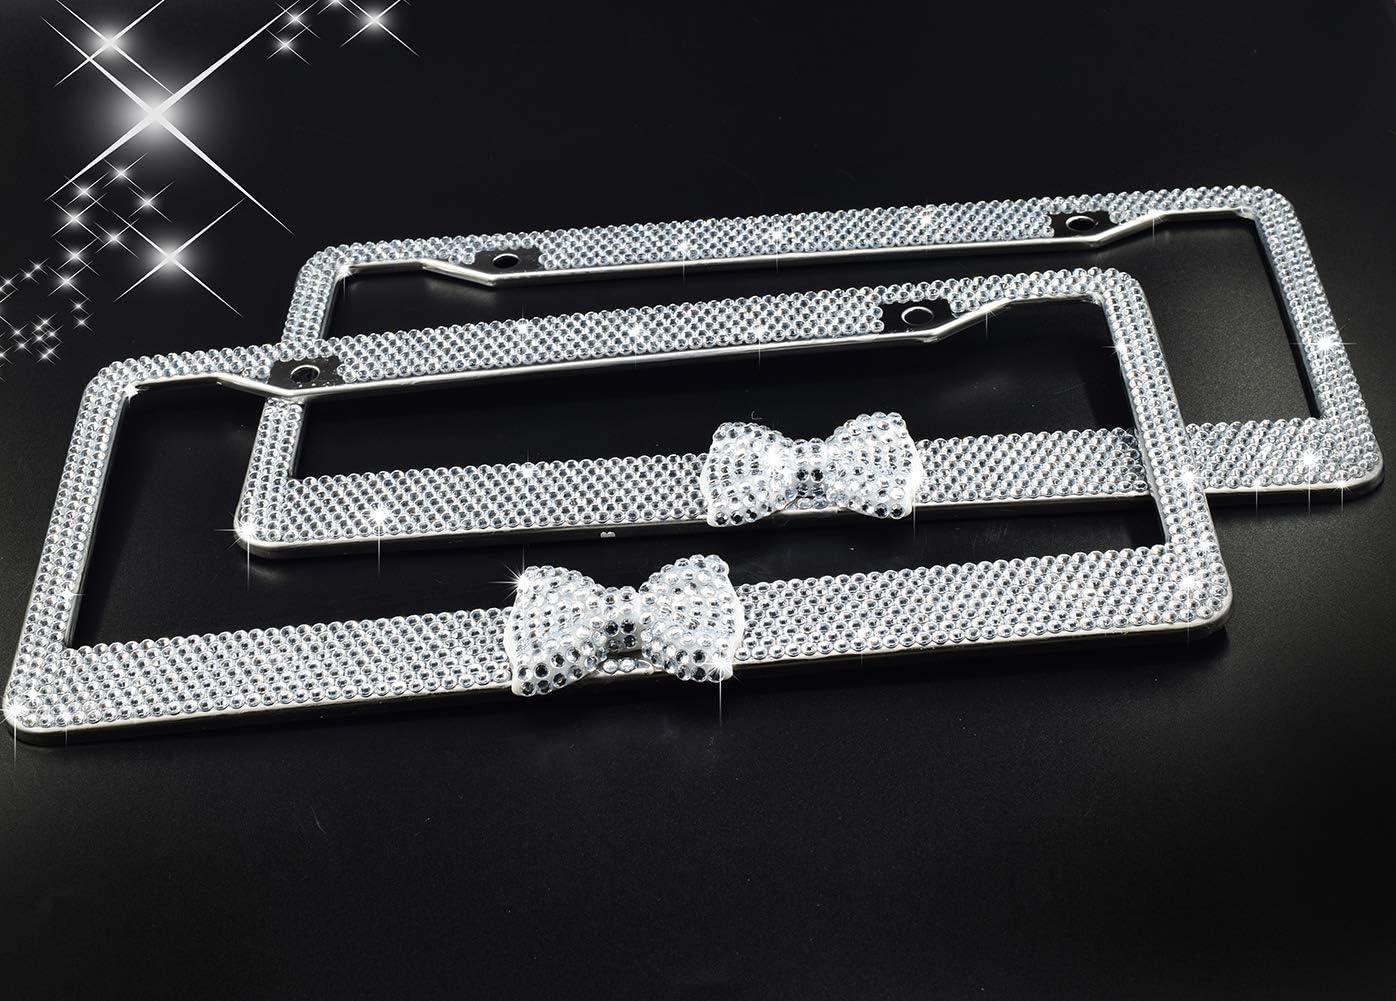 Handmade Waterproof Glitter Rhinestones Crystal Plate Frames for Cars with Screws Caps Set Gift White Bowtie License Plate Frames 2 Pack Bling Bling White Bow